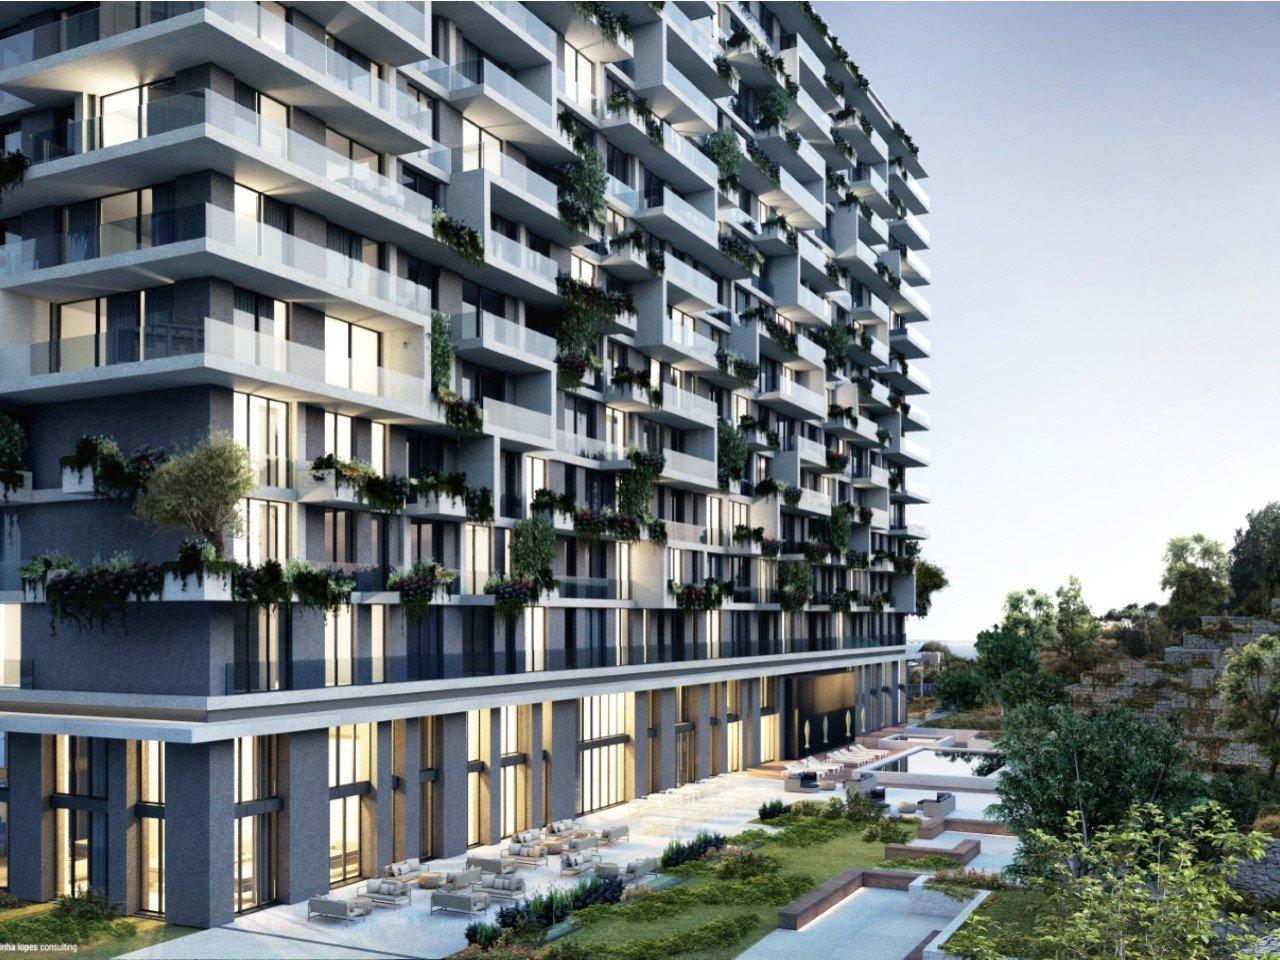 4 Bedroom Apartment Lisbon, Lisbon Ref: AMA14137